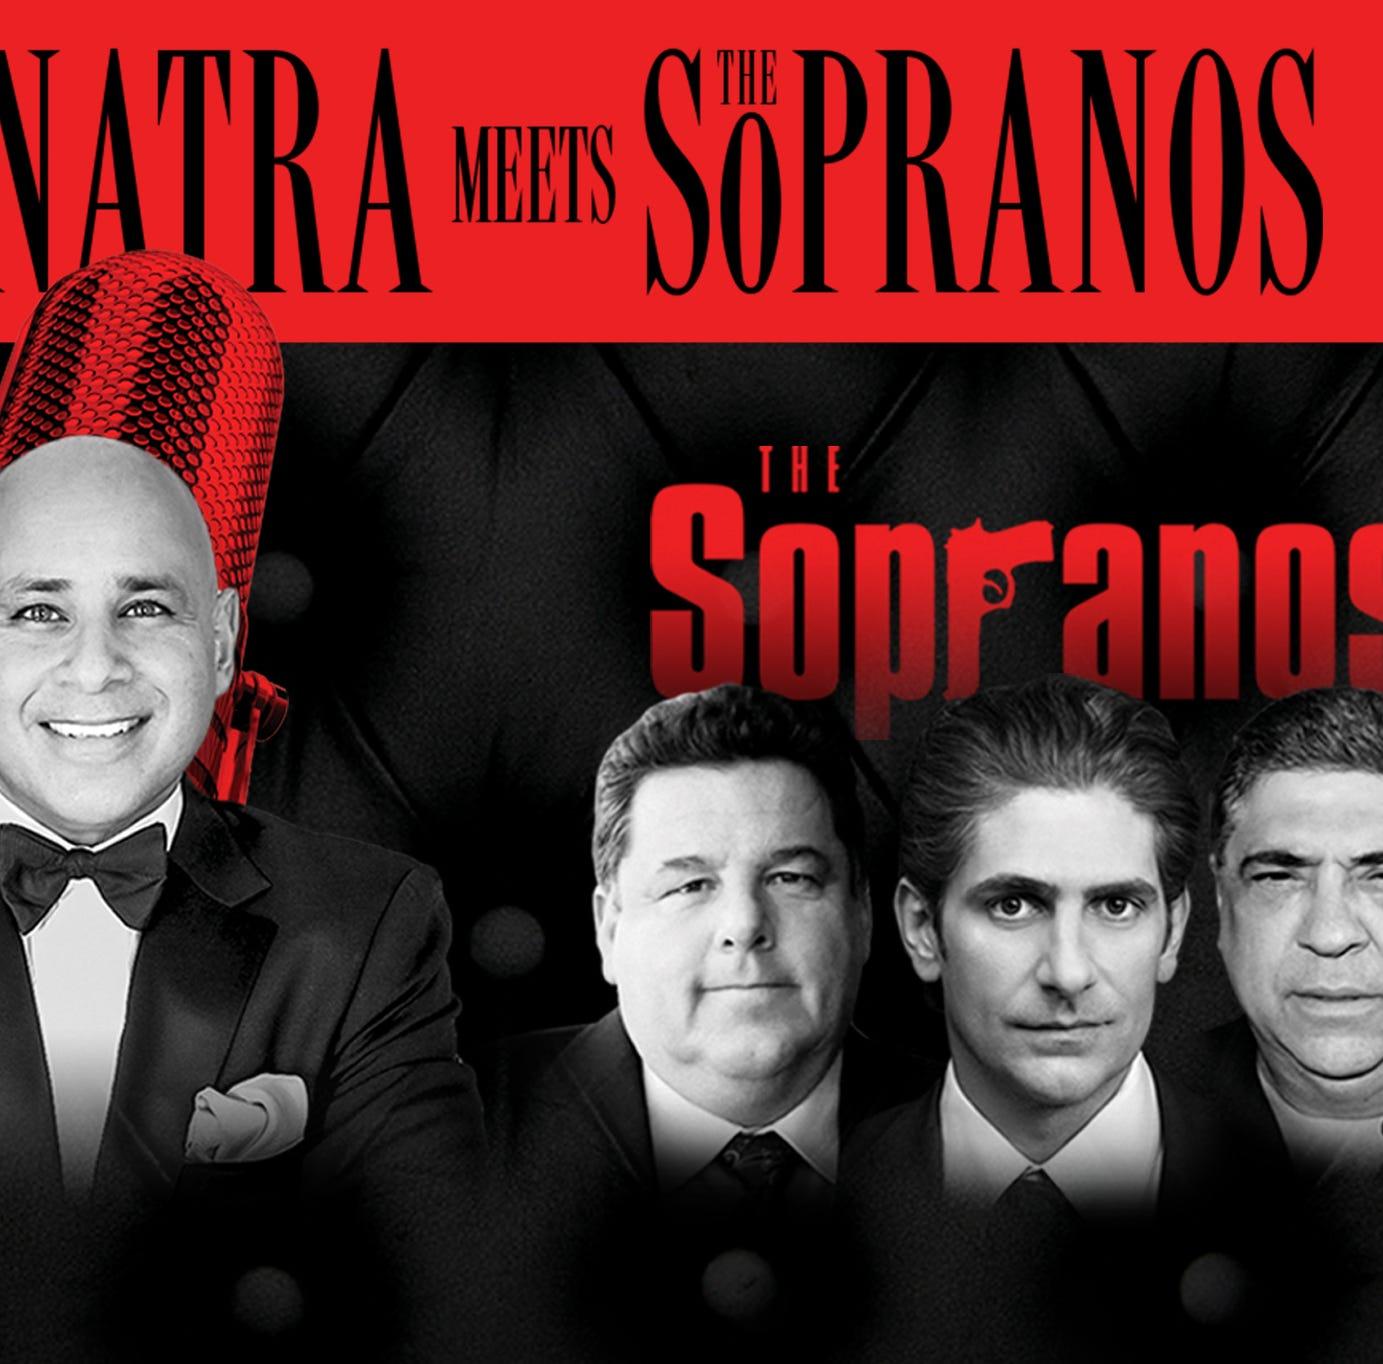 Mob mentality: 'Sinatra Meets The Sopranos' hits A.C.'s Borgata